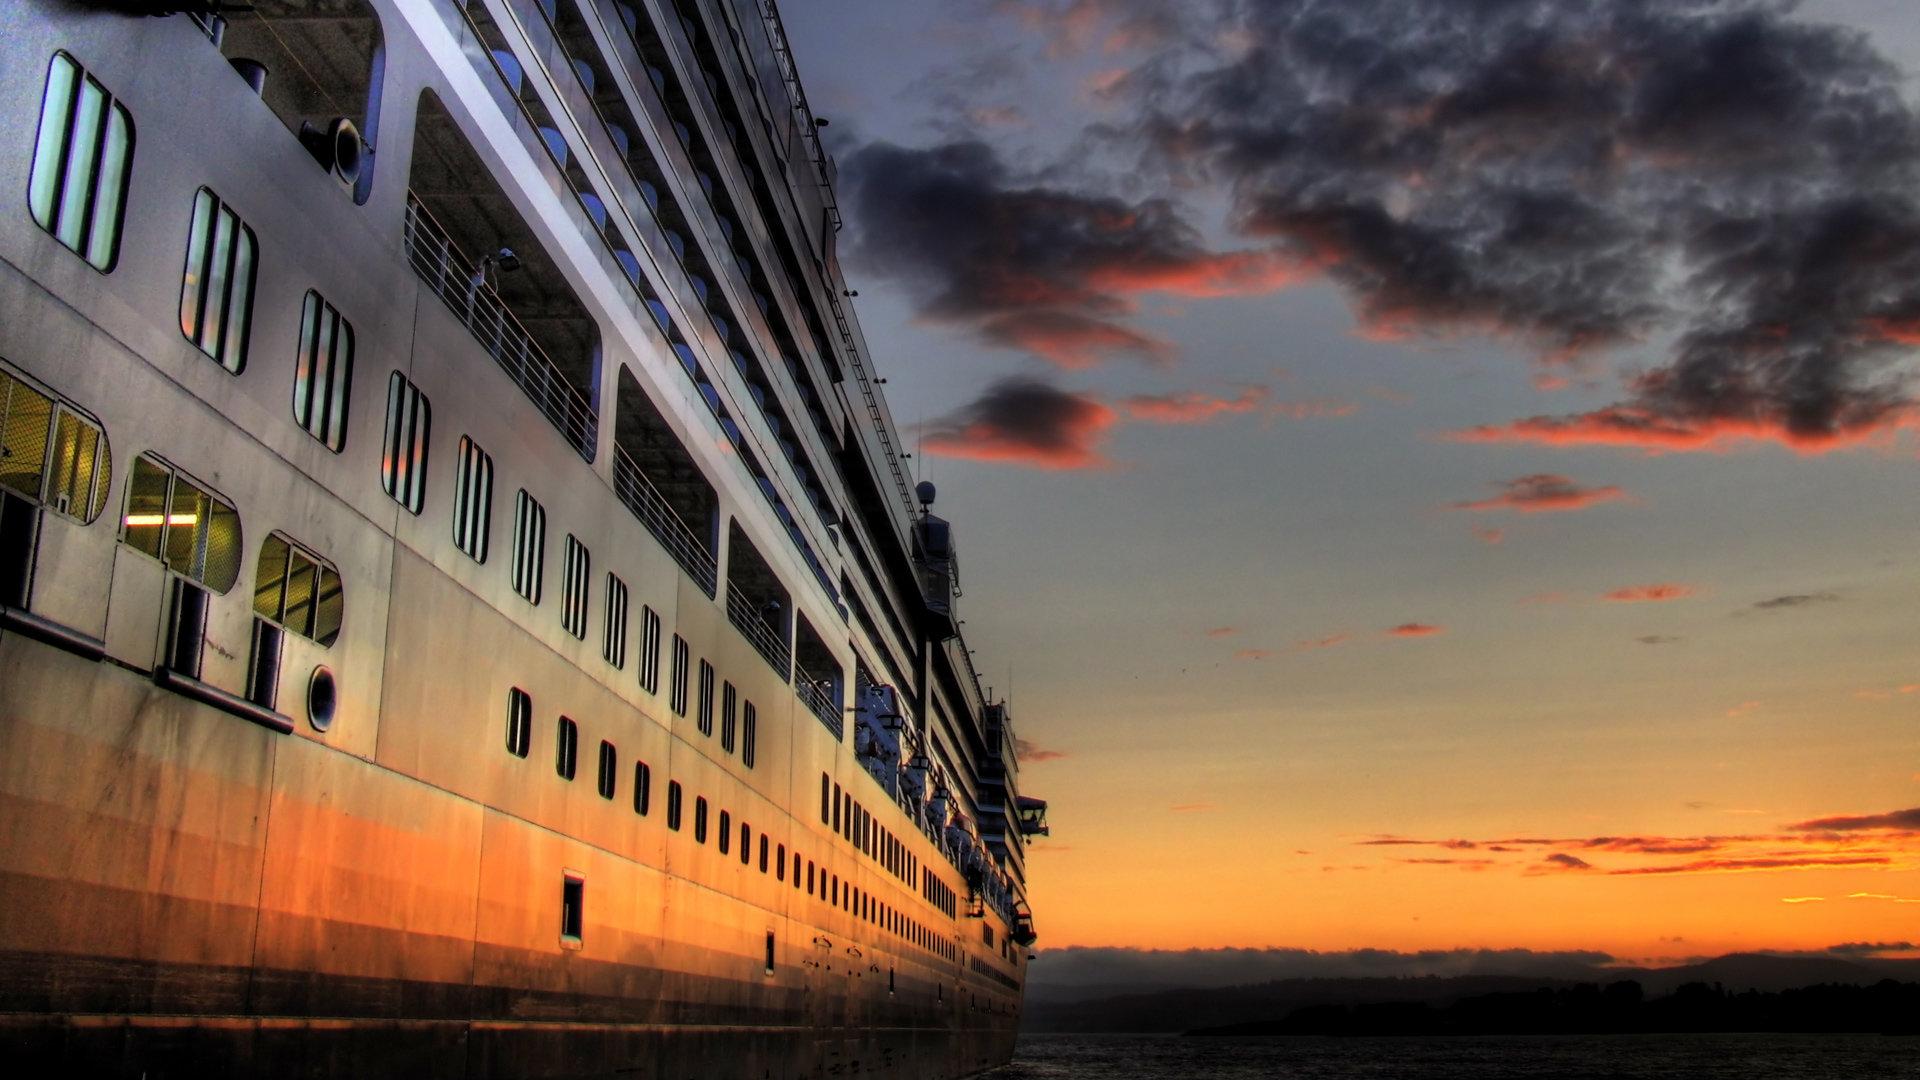 Cruise Ship Wallpapers 1920x1080 Full Hd 1080p Desktop Backgrounds